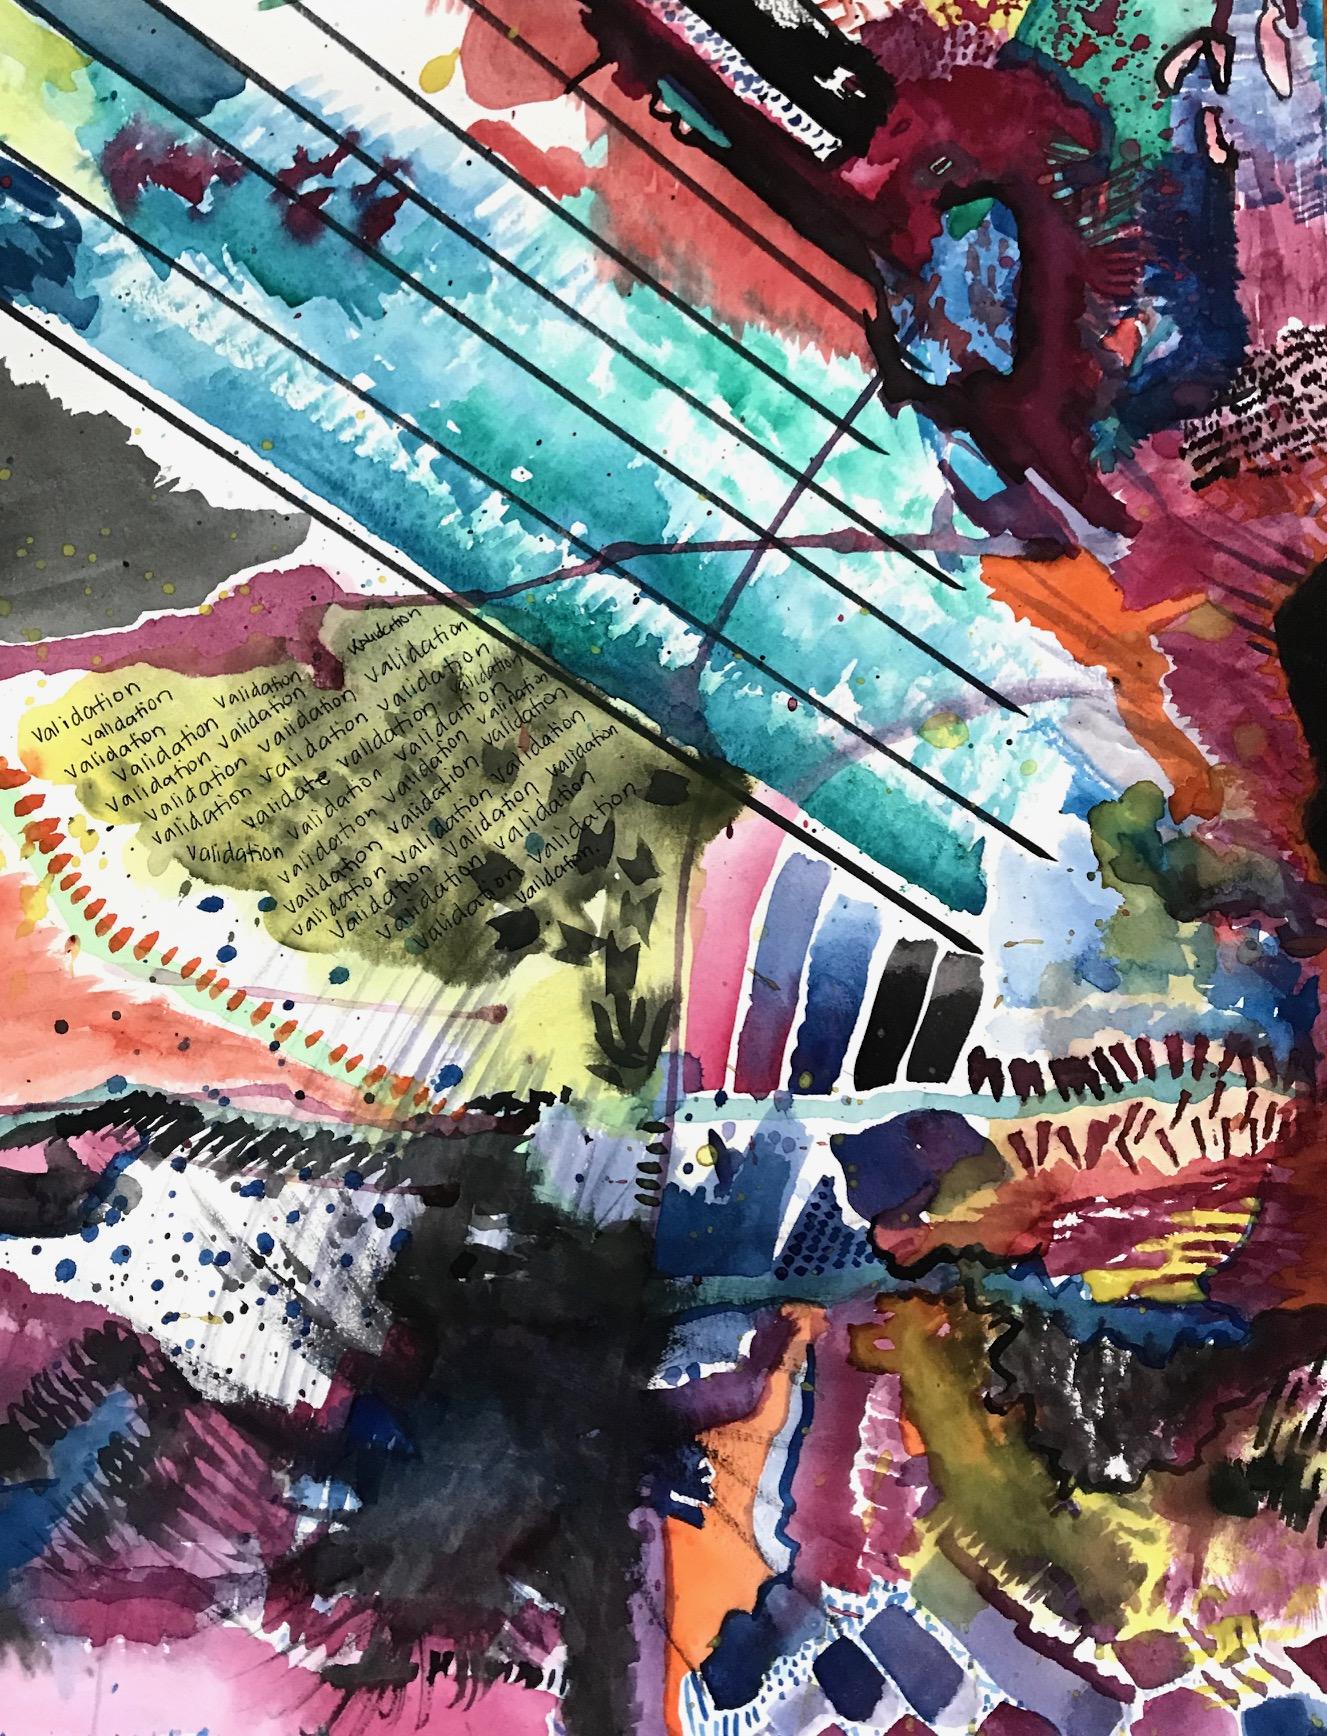 'Validation' - Olympia, WA - 2018 - 18x24 Watercolor/ink